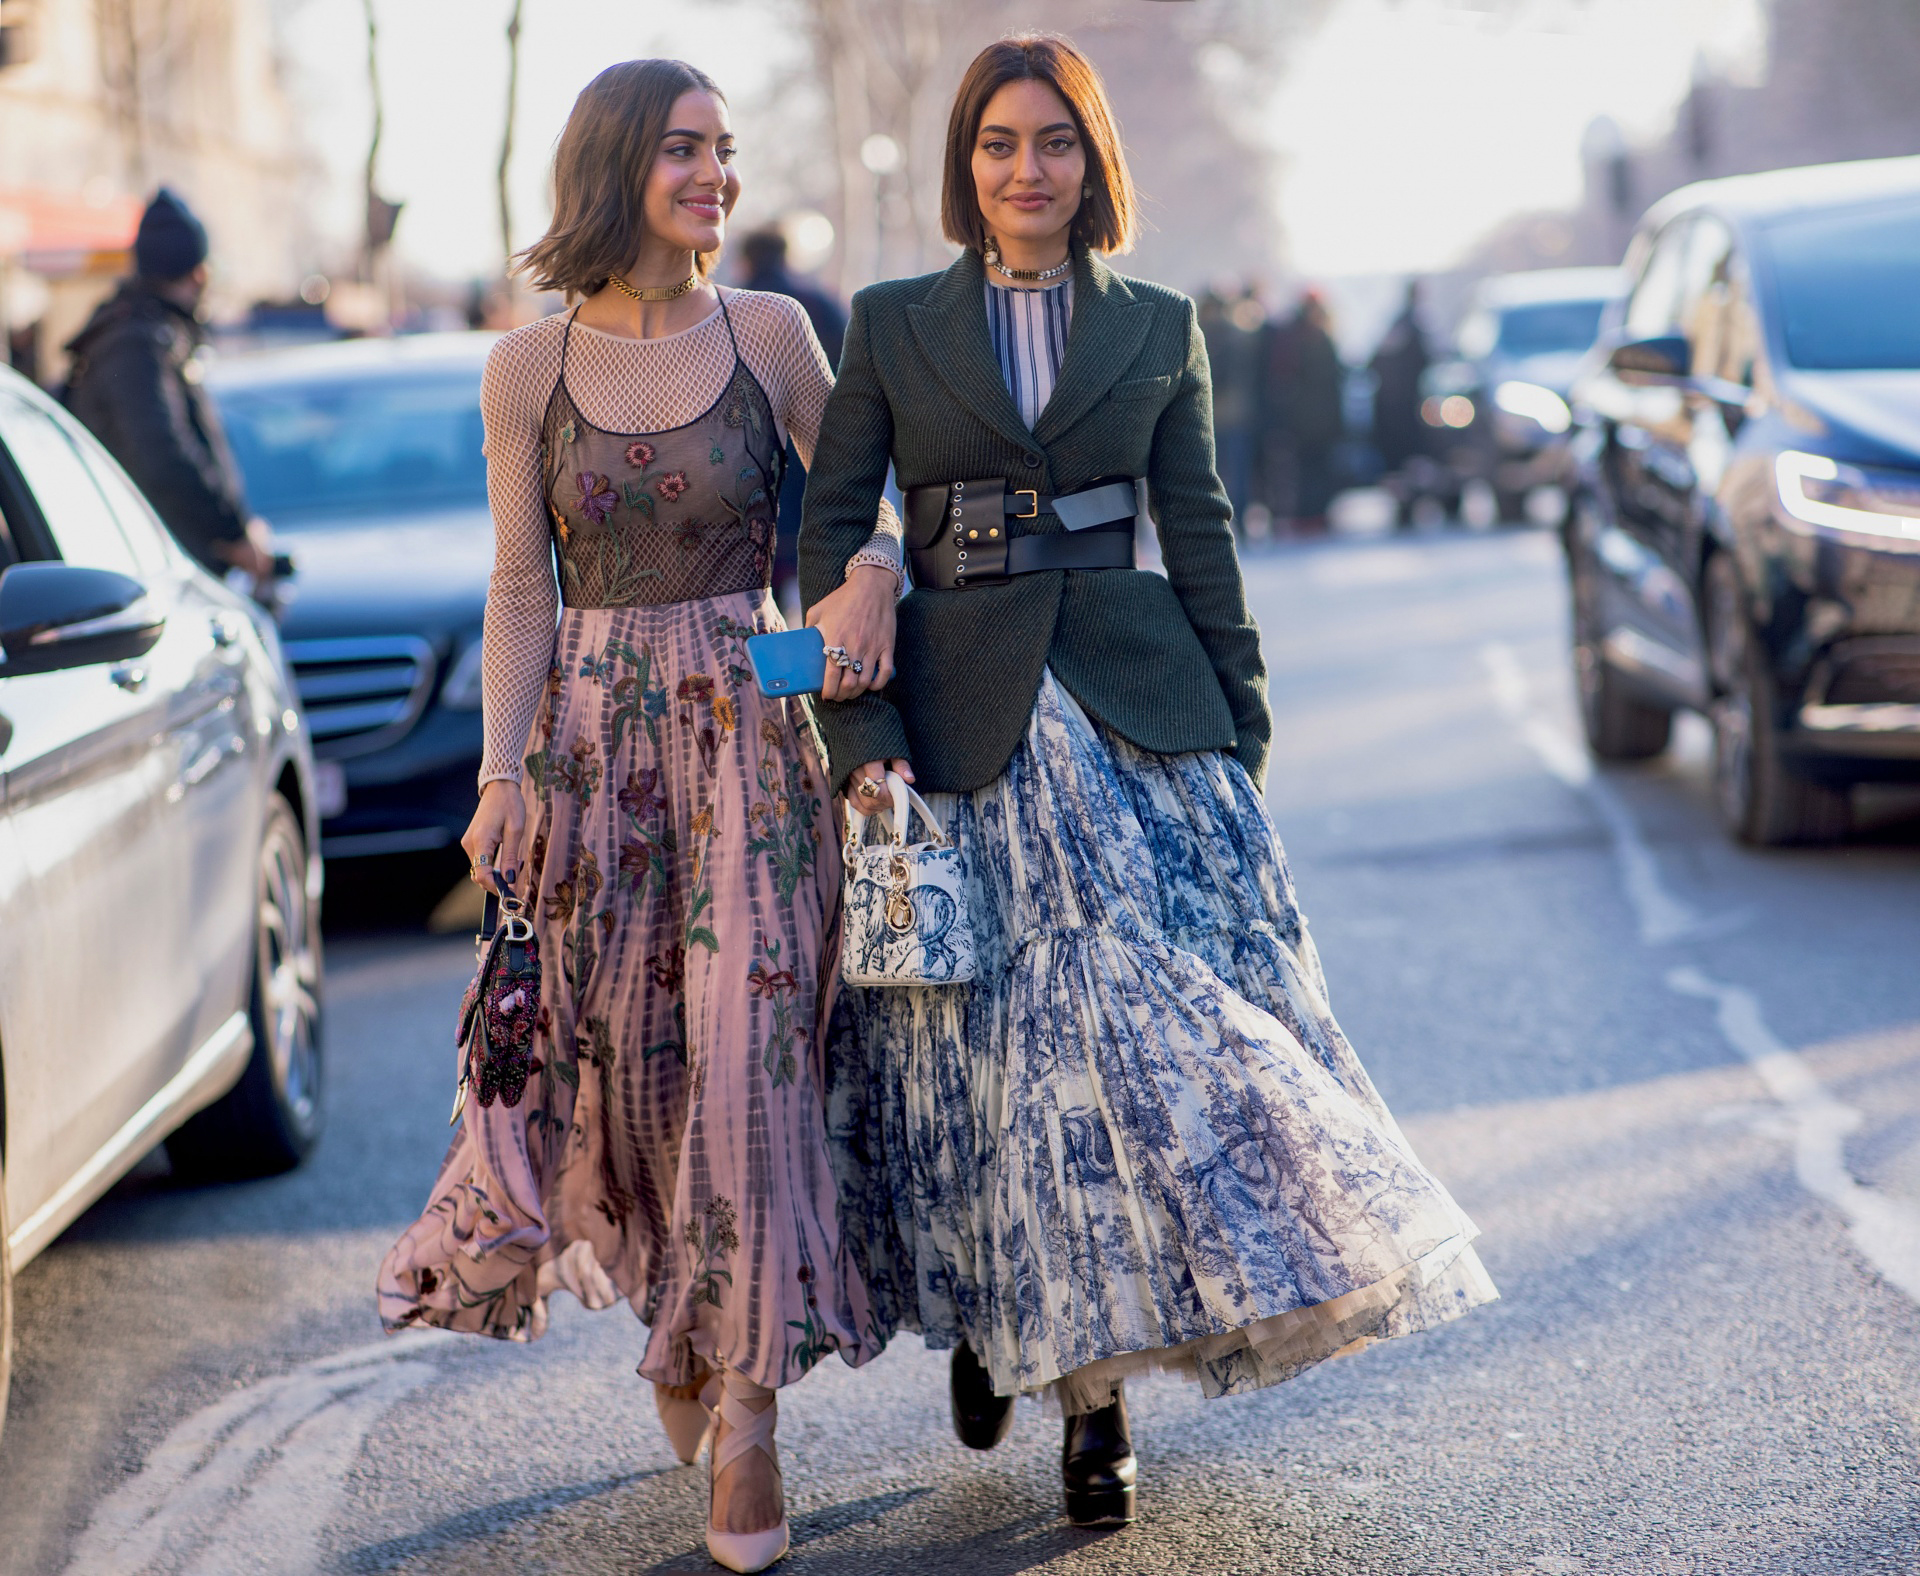 Camila Coelho et Karen Wazen Bakhazi @ Paris Couture Week Printemps-Eté 2019.jpg